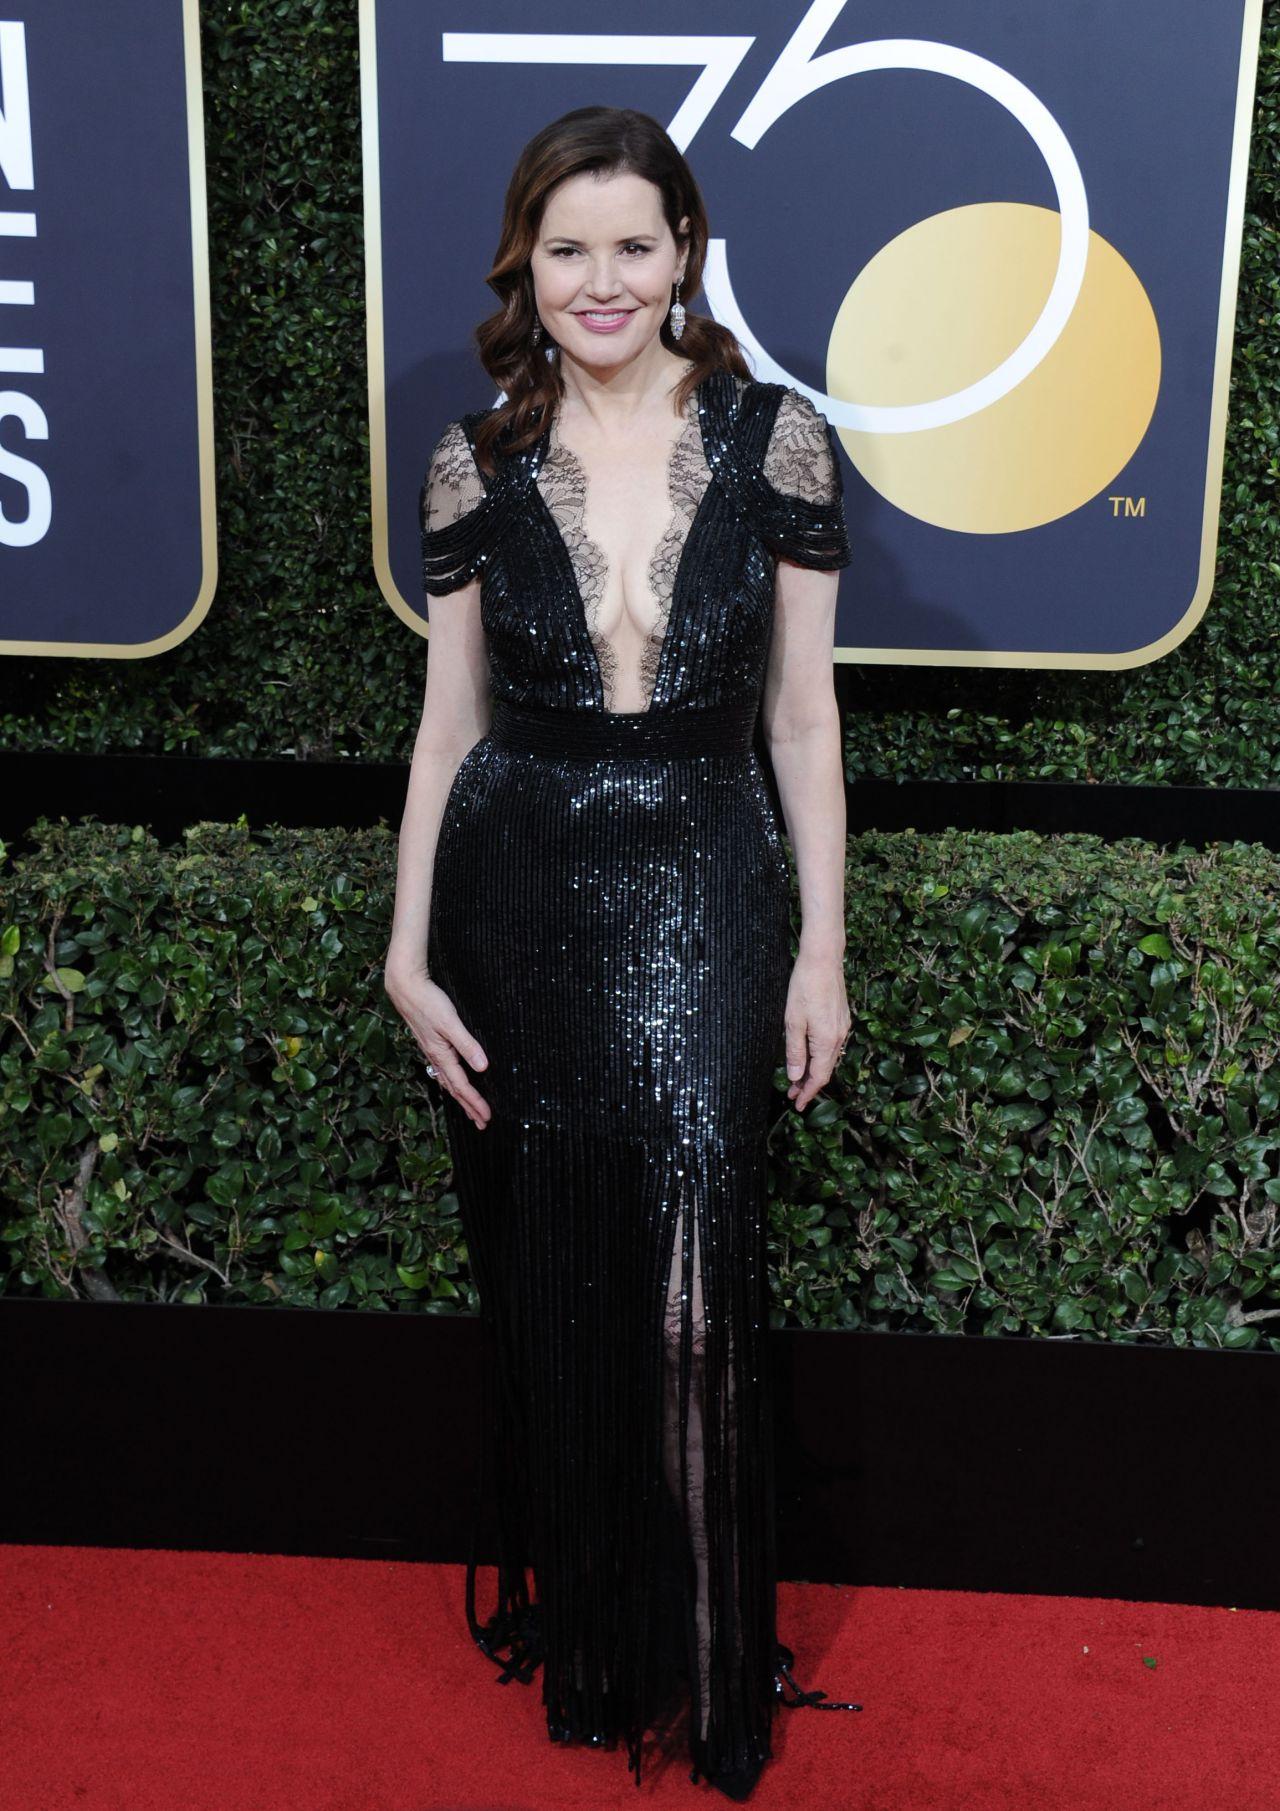 Geena Davis Golden Globe Awards 2018